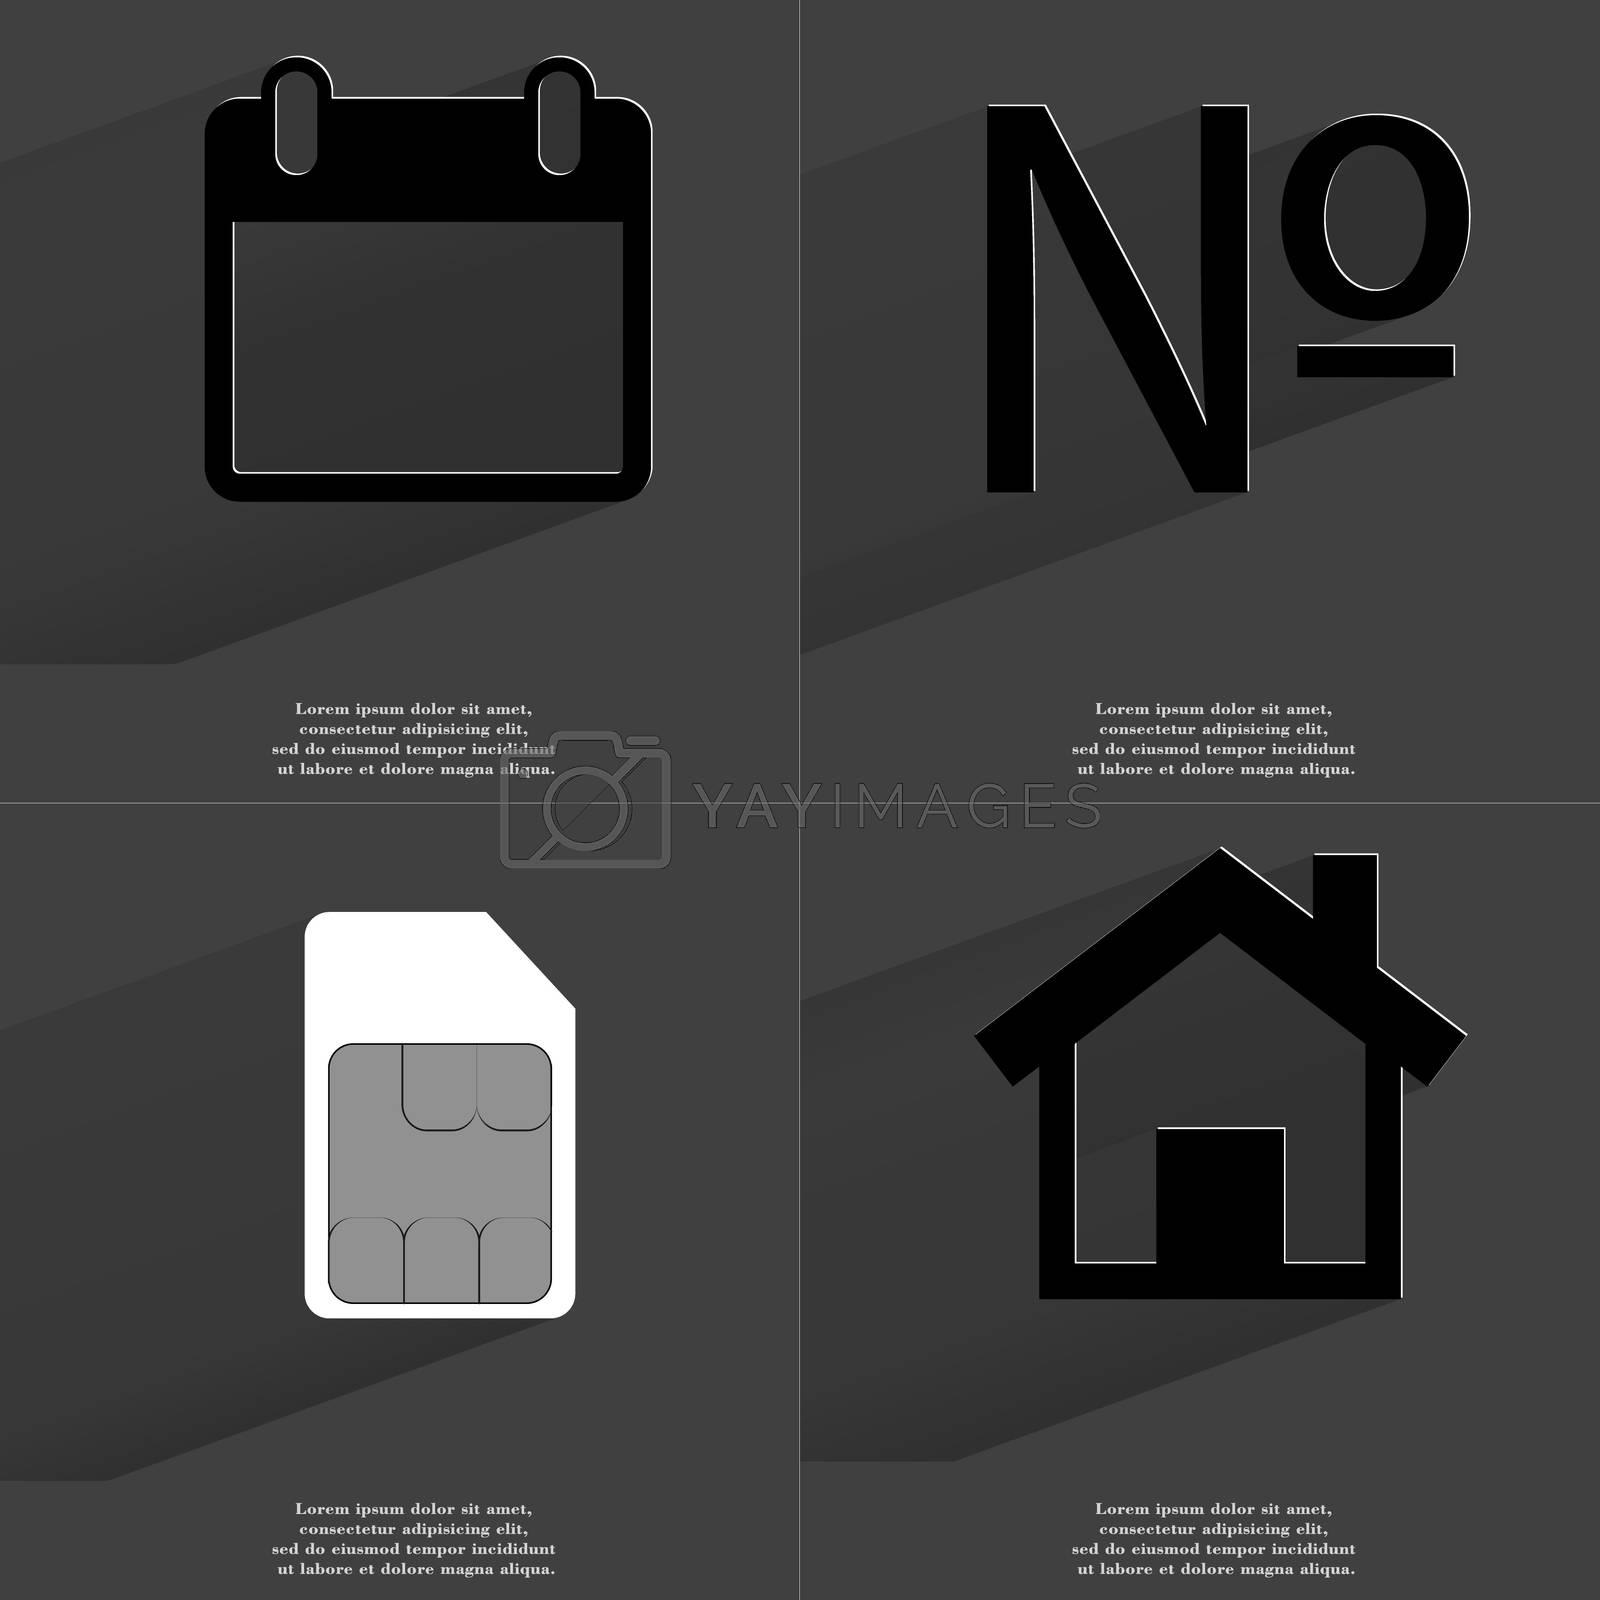 Royalty free image of Calendar, Numero sign, SIM card, House. Symbols with long shadow. Flat design by serhii_lohvyniuk